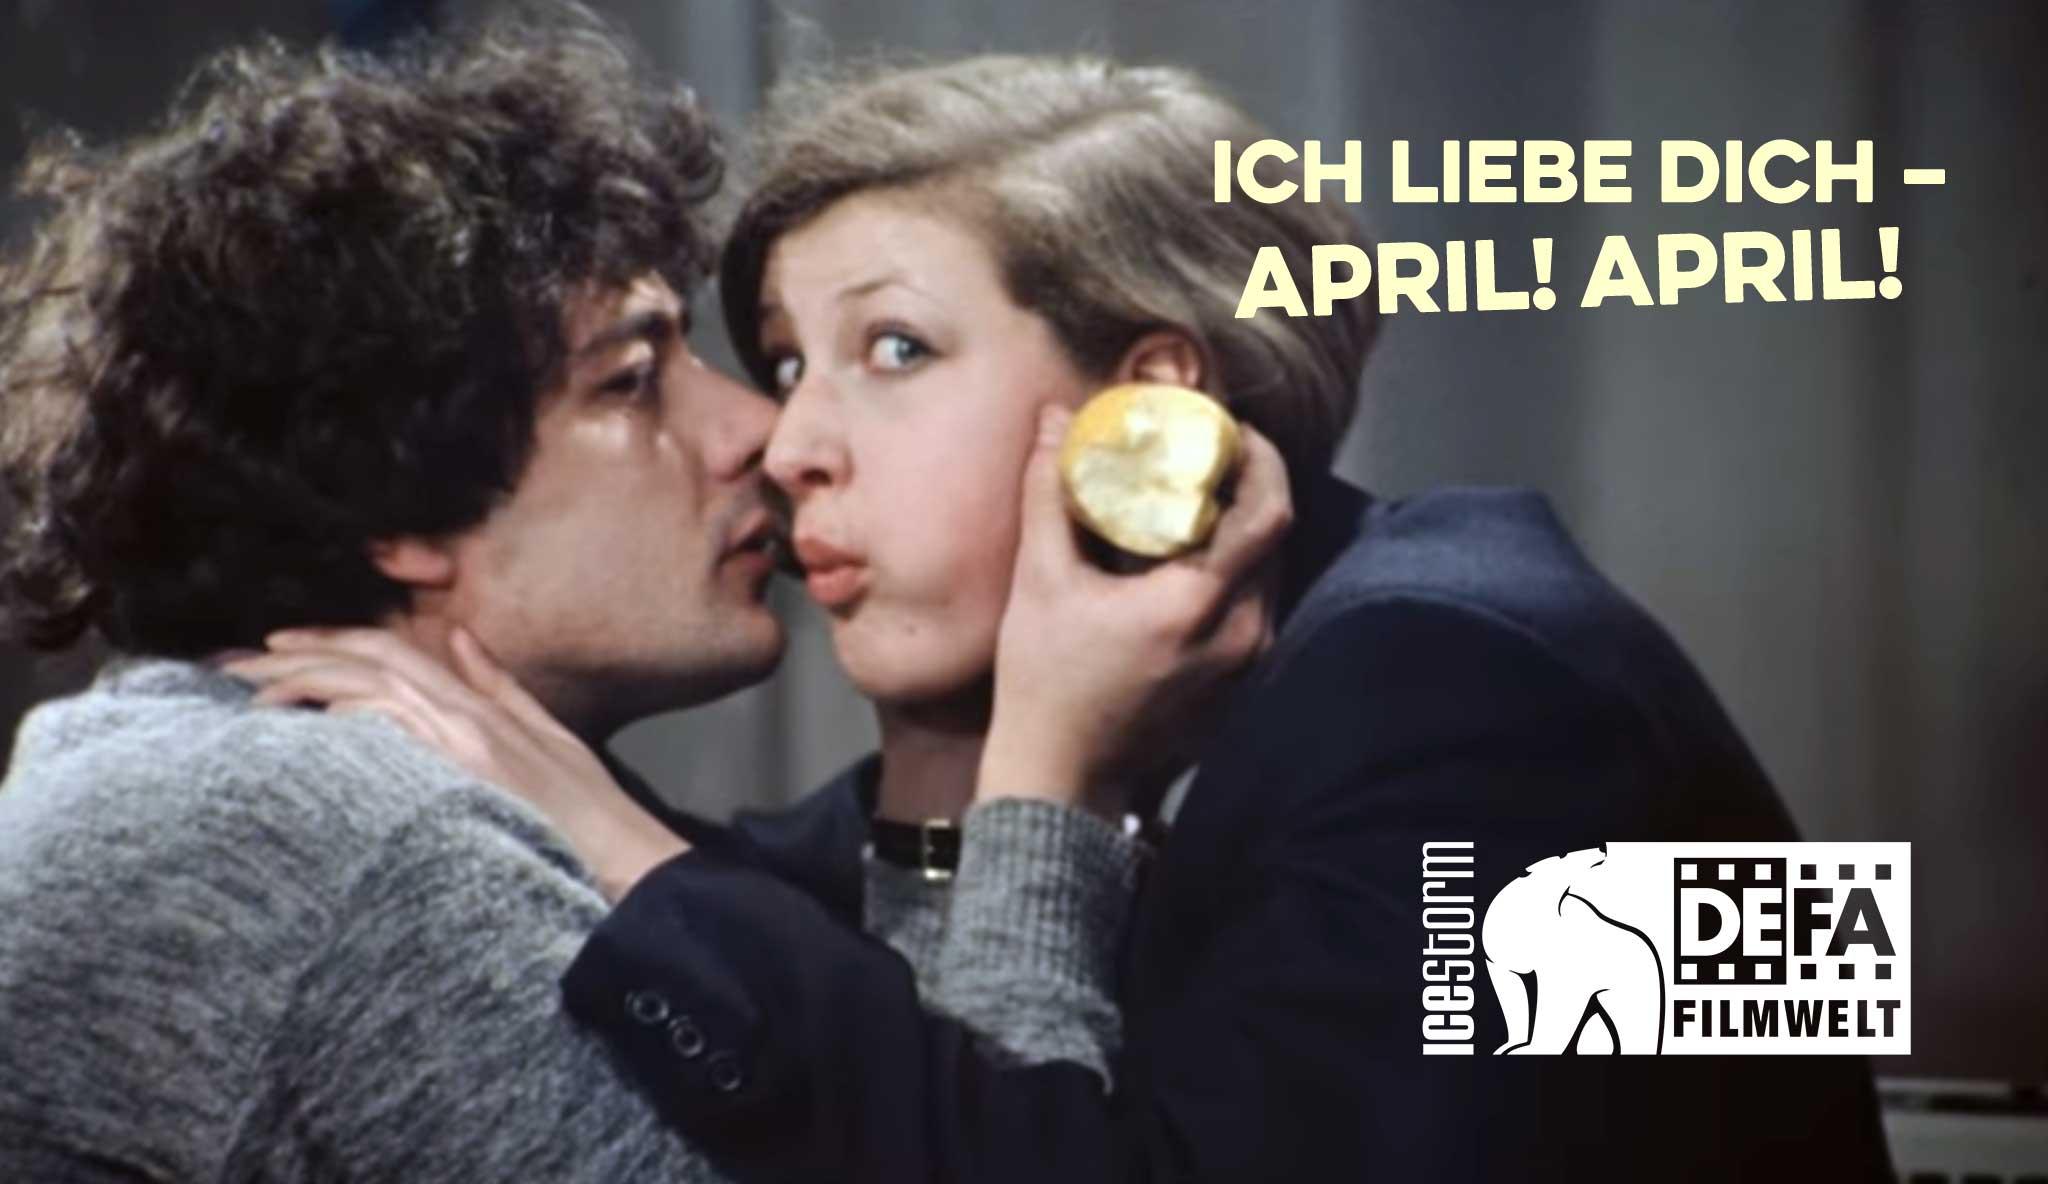 ich-liebe-dich-april-april\header.jpg